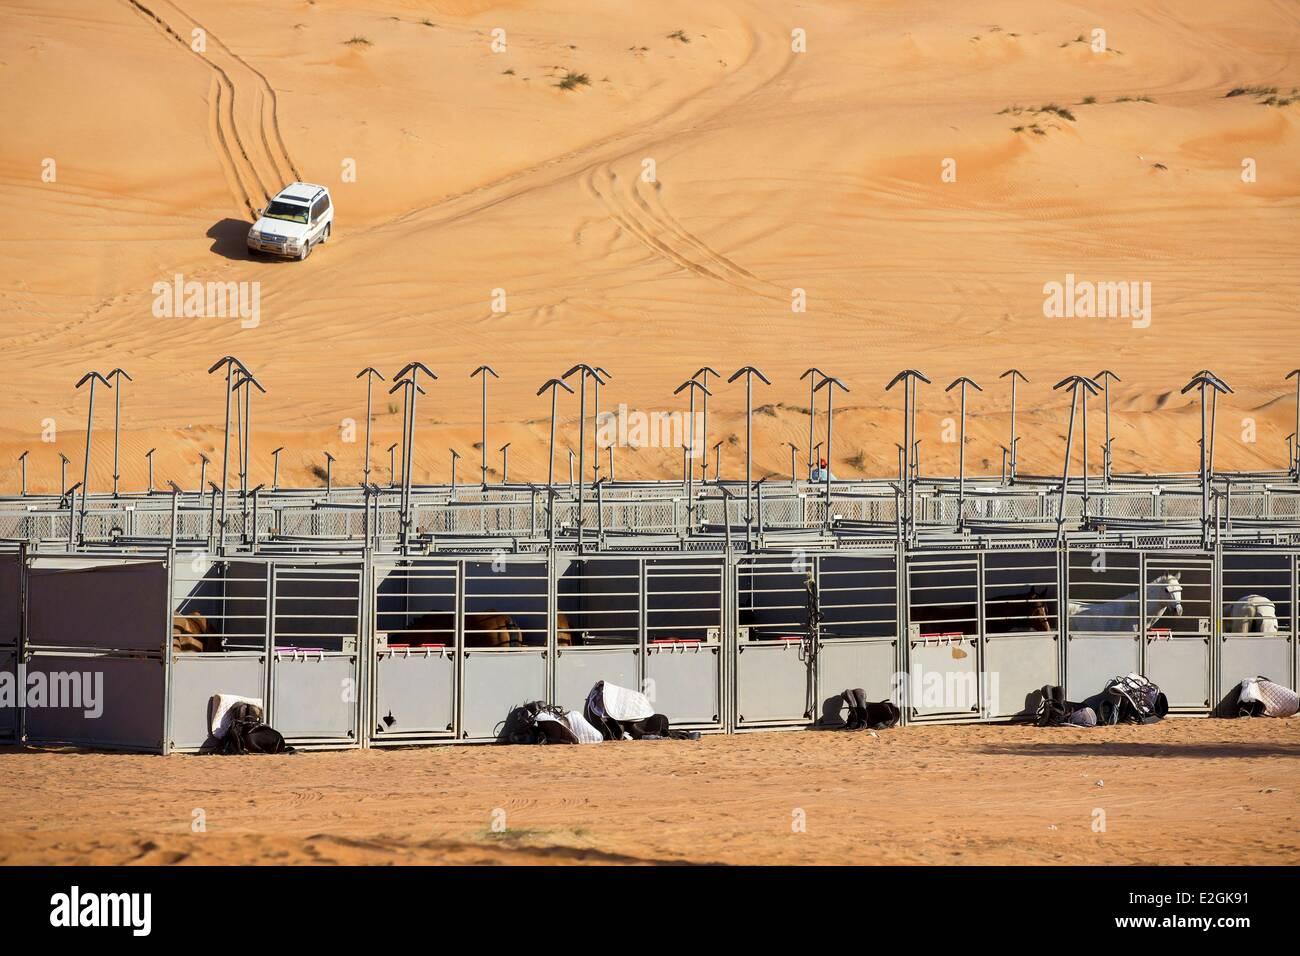 Sultanate of Oman Ash Sharqiyyah region Wahiba desert equestrian adventure Gallops of Oman Tawi Wareed camp box - Stock Image